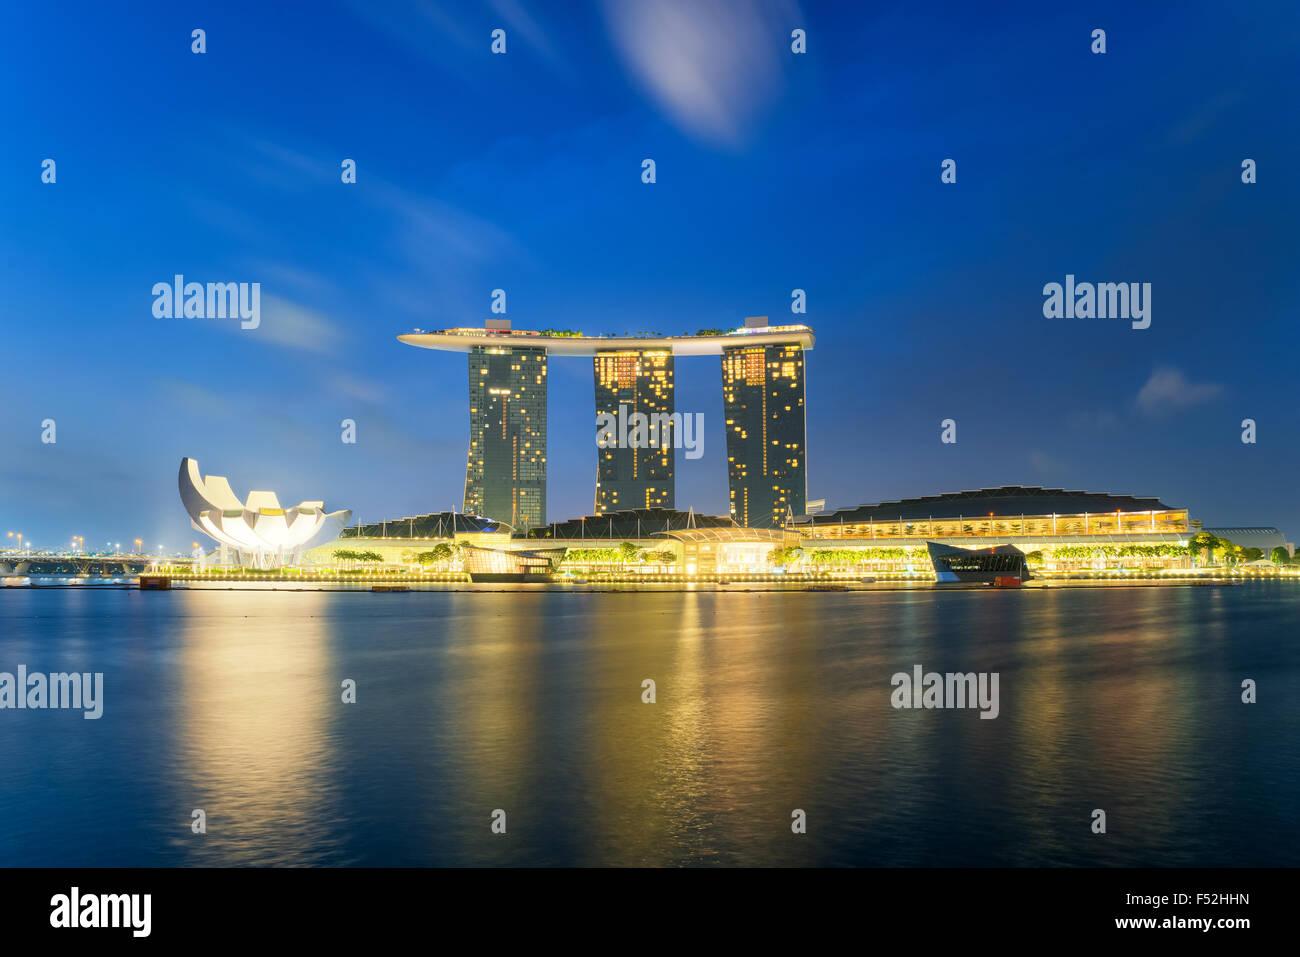 Beautiful sunrise in Marina bay at Singapore - Stock Image